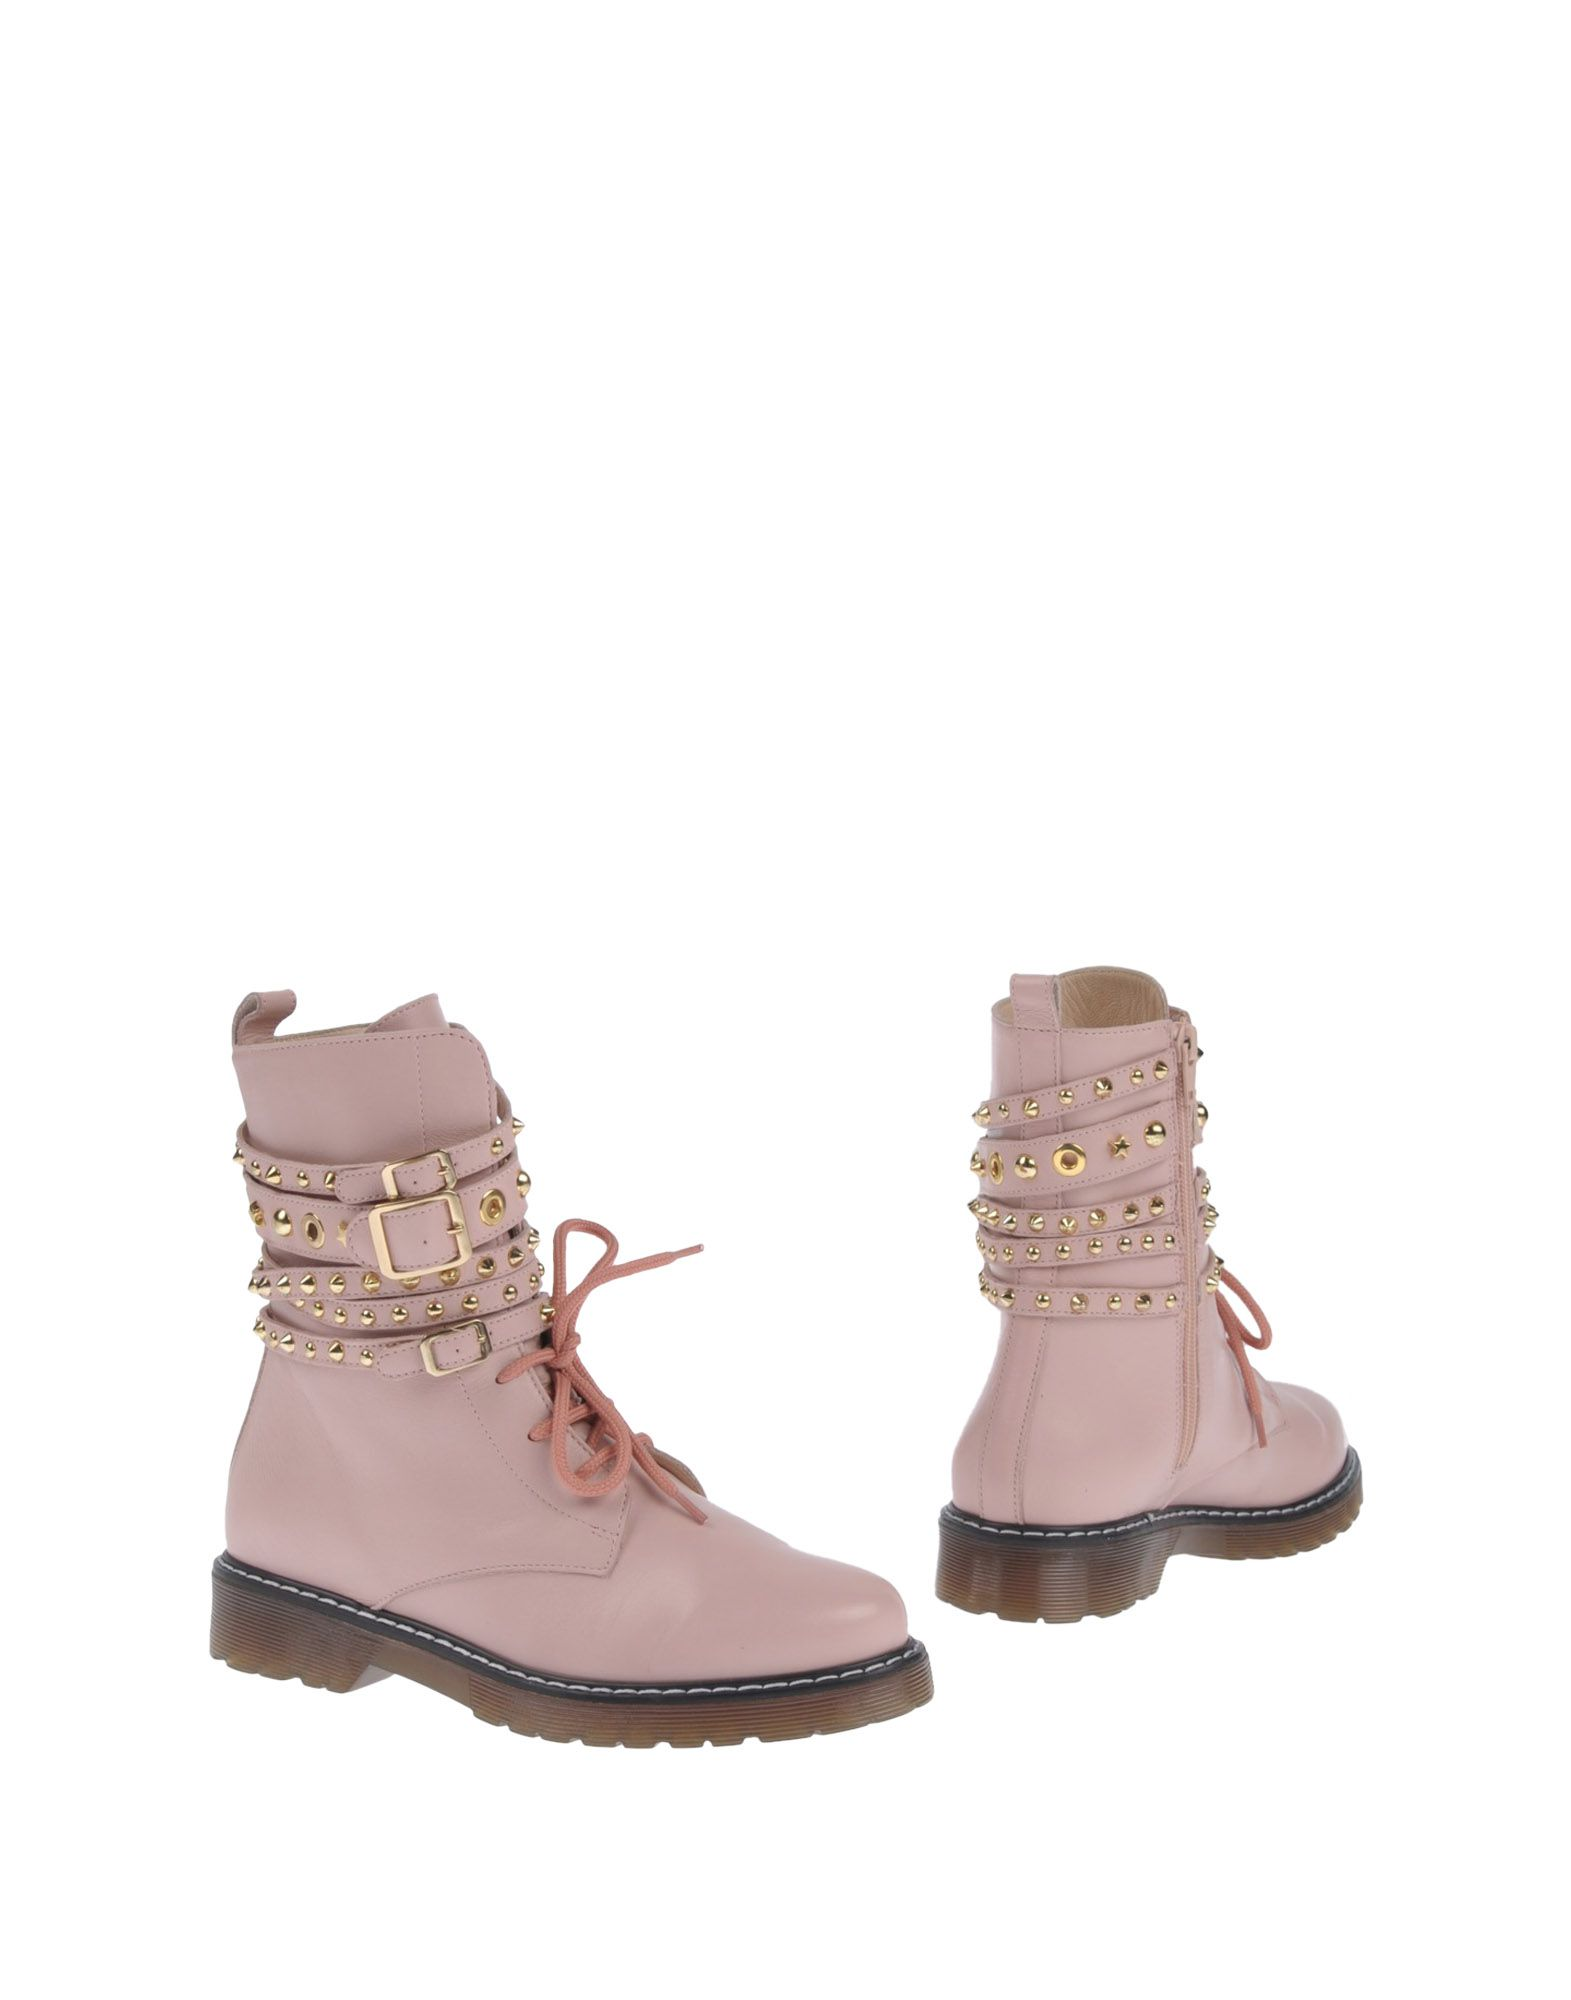 Rabatt Schuhe Stiefelette Blugirl Blumarine Stiefelette Schuhe Damen  11445692KF 6f0e48